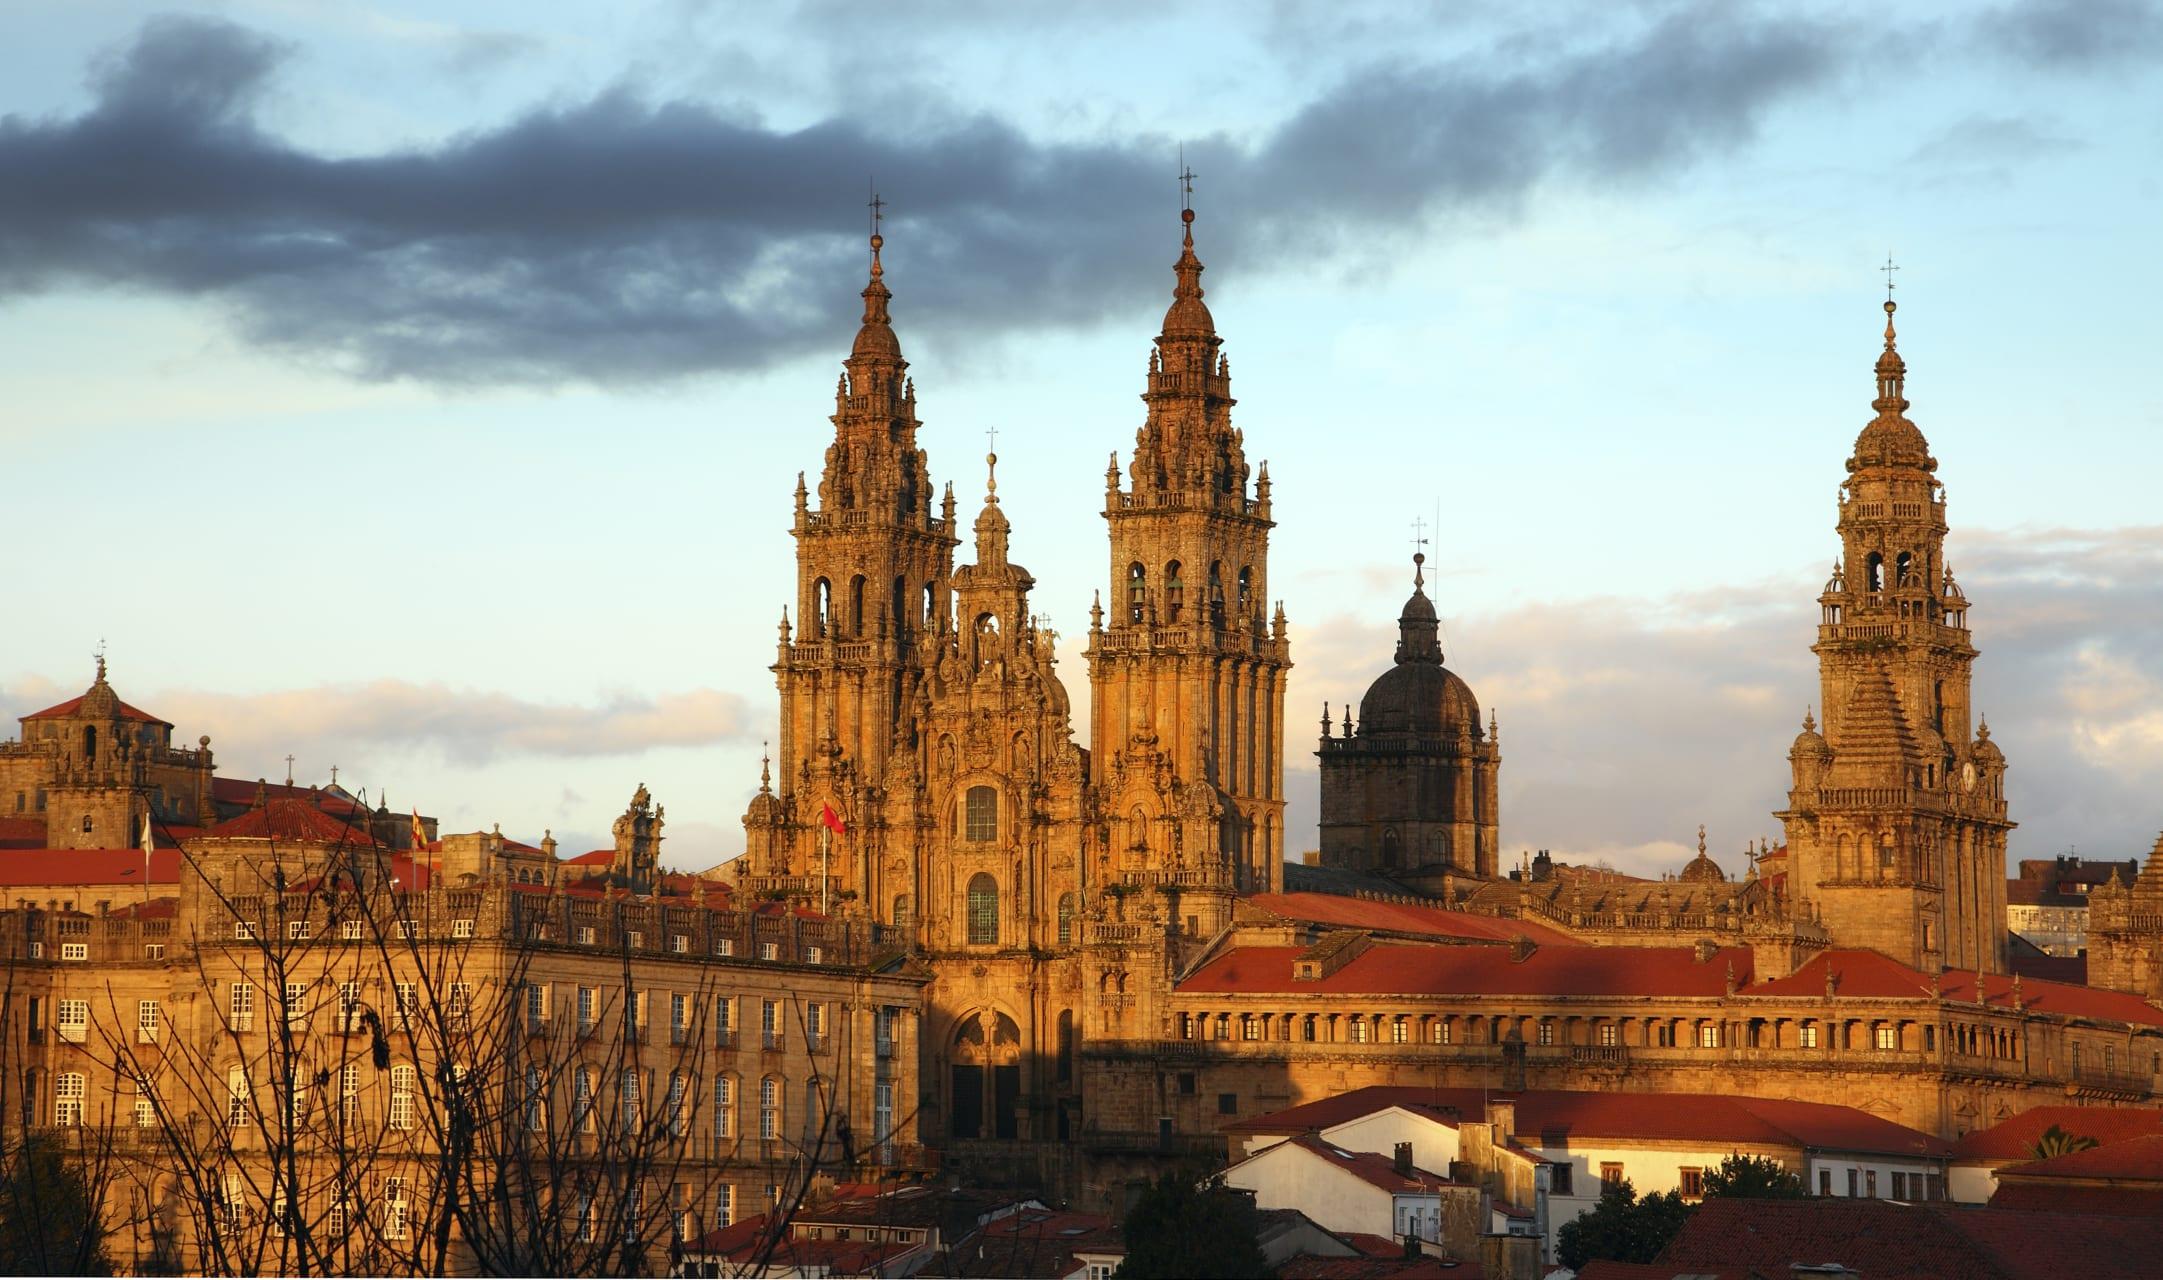 Santiago de Compostela cover image